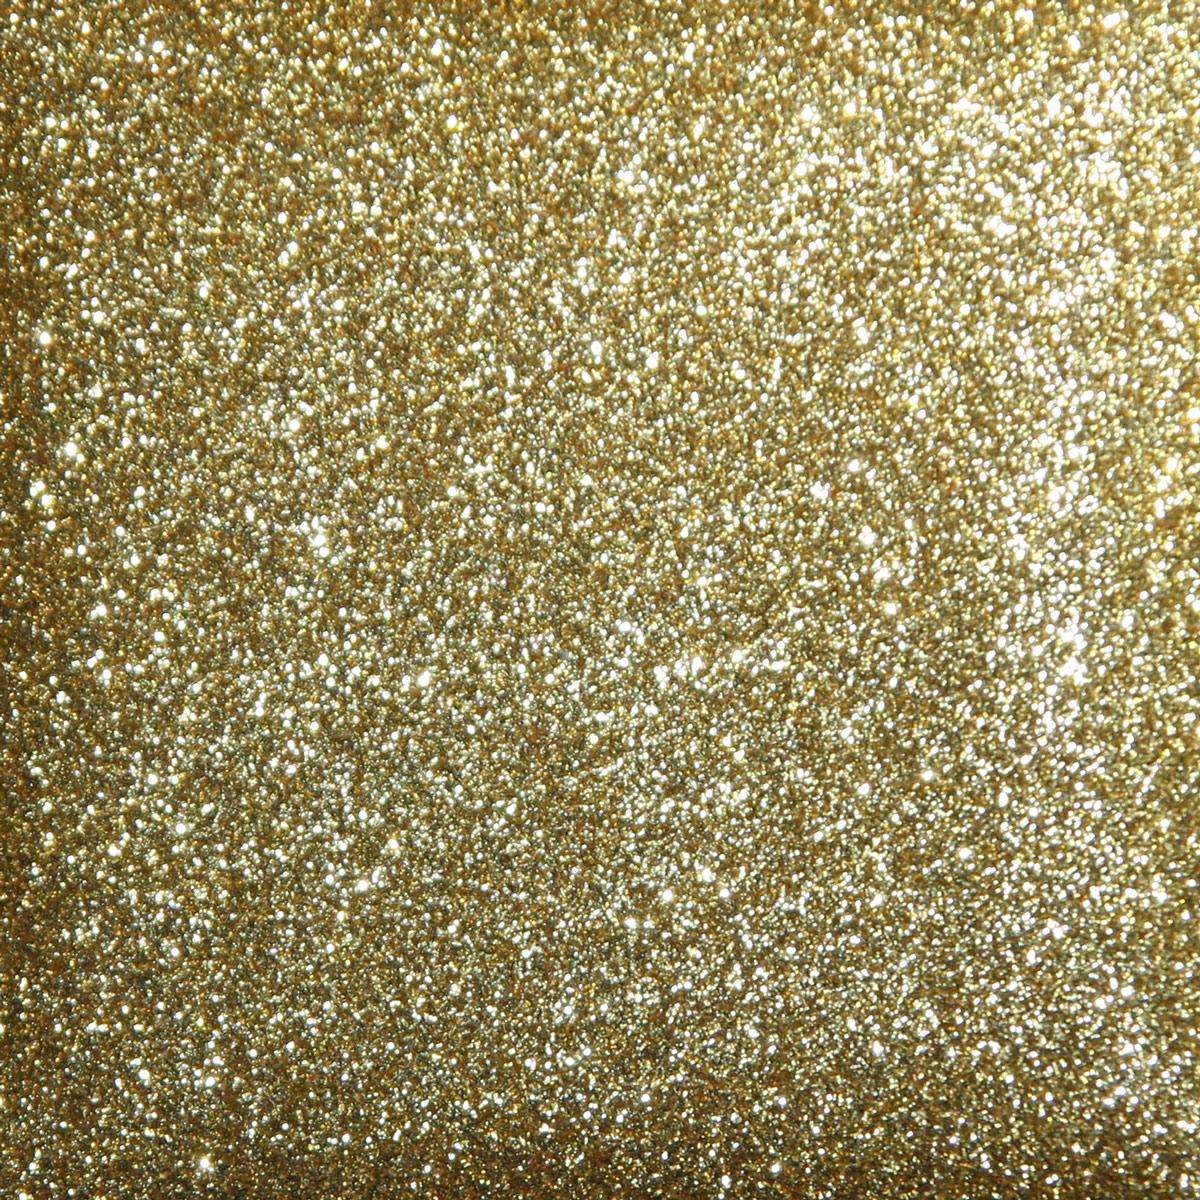 Glitter flex film